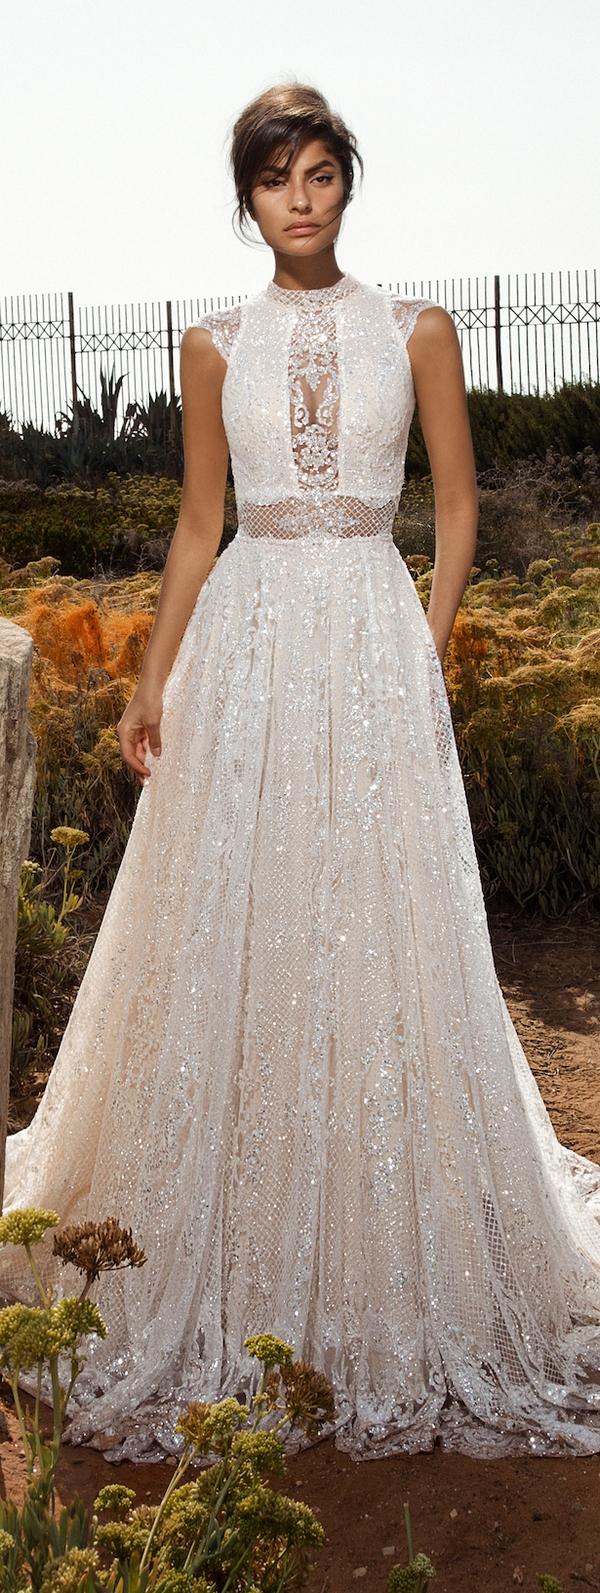 sparkling halter neckline border sleeve wedding dress with an illusion neckline and a sparkling textural skirt